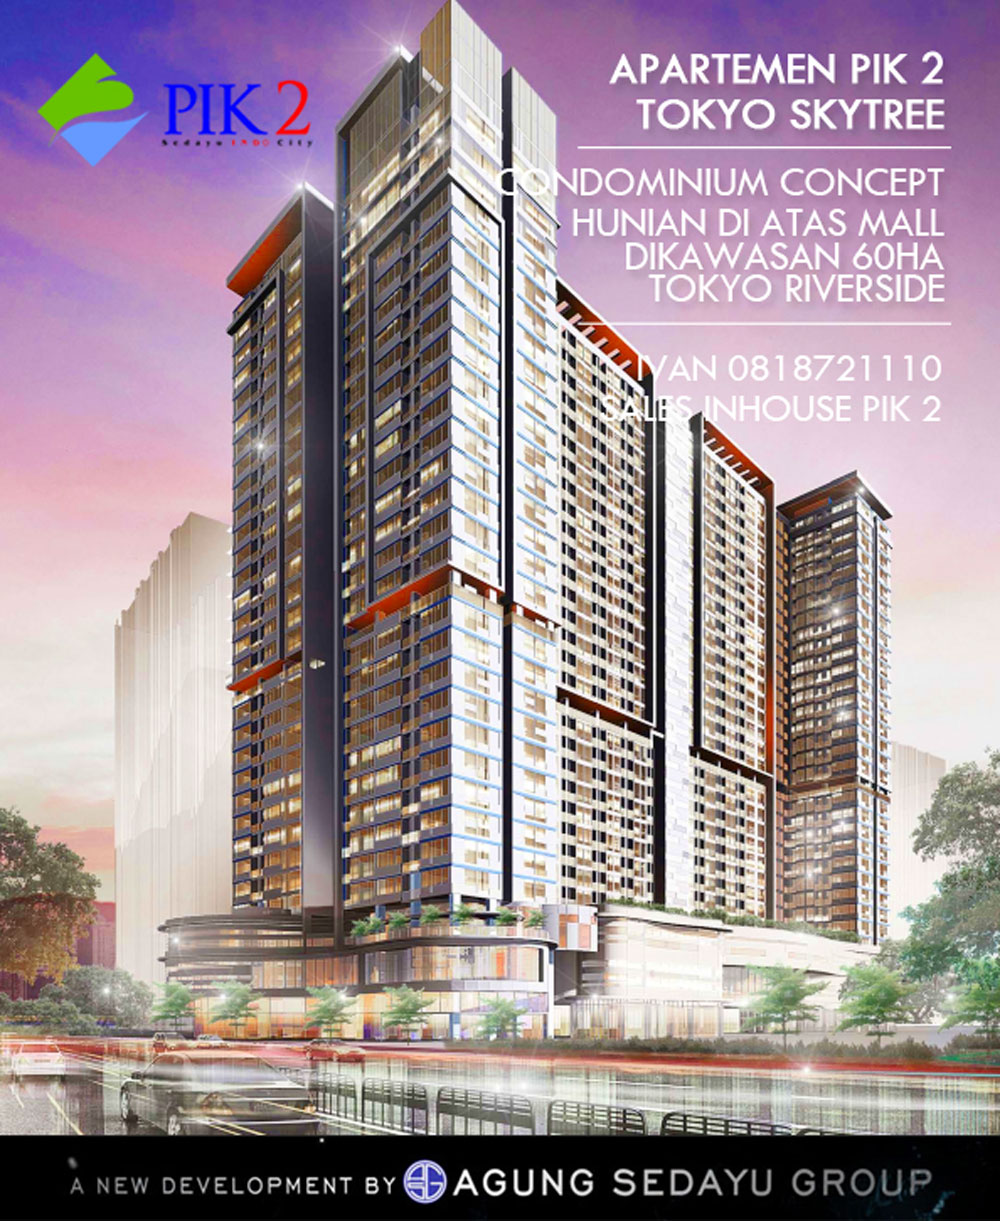 image tower skytree